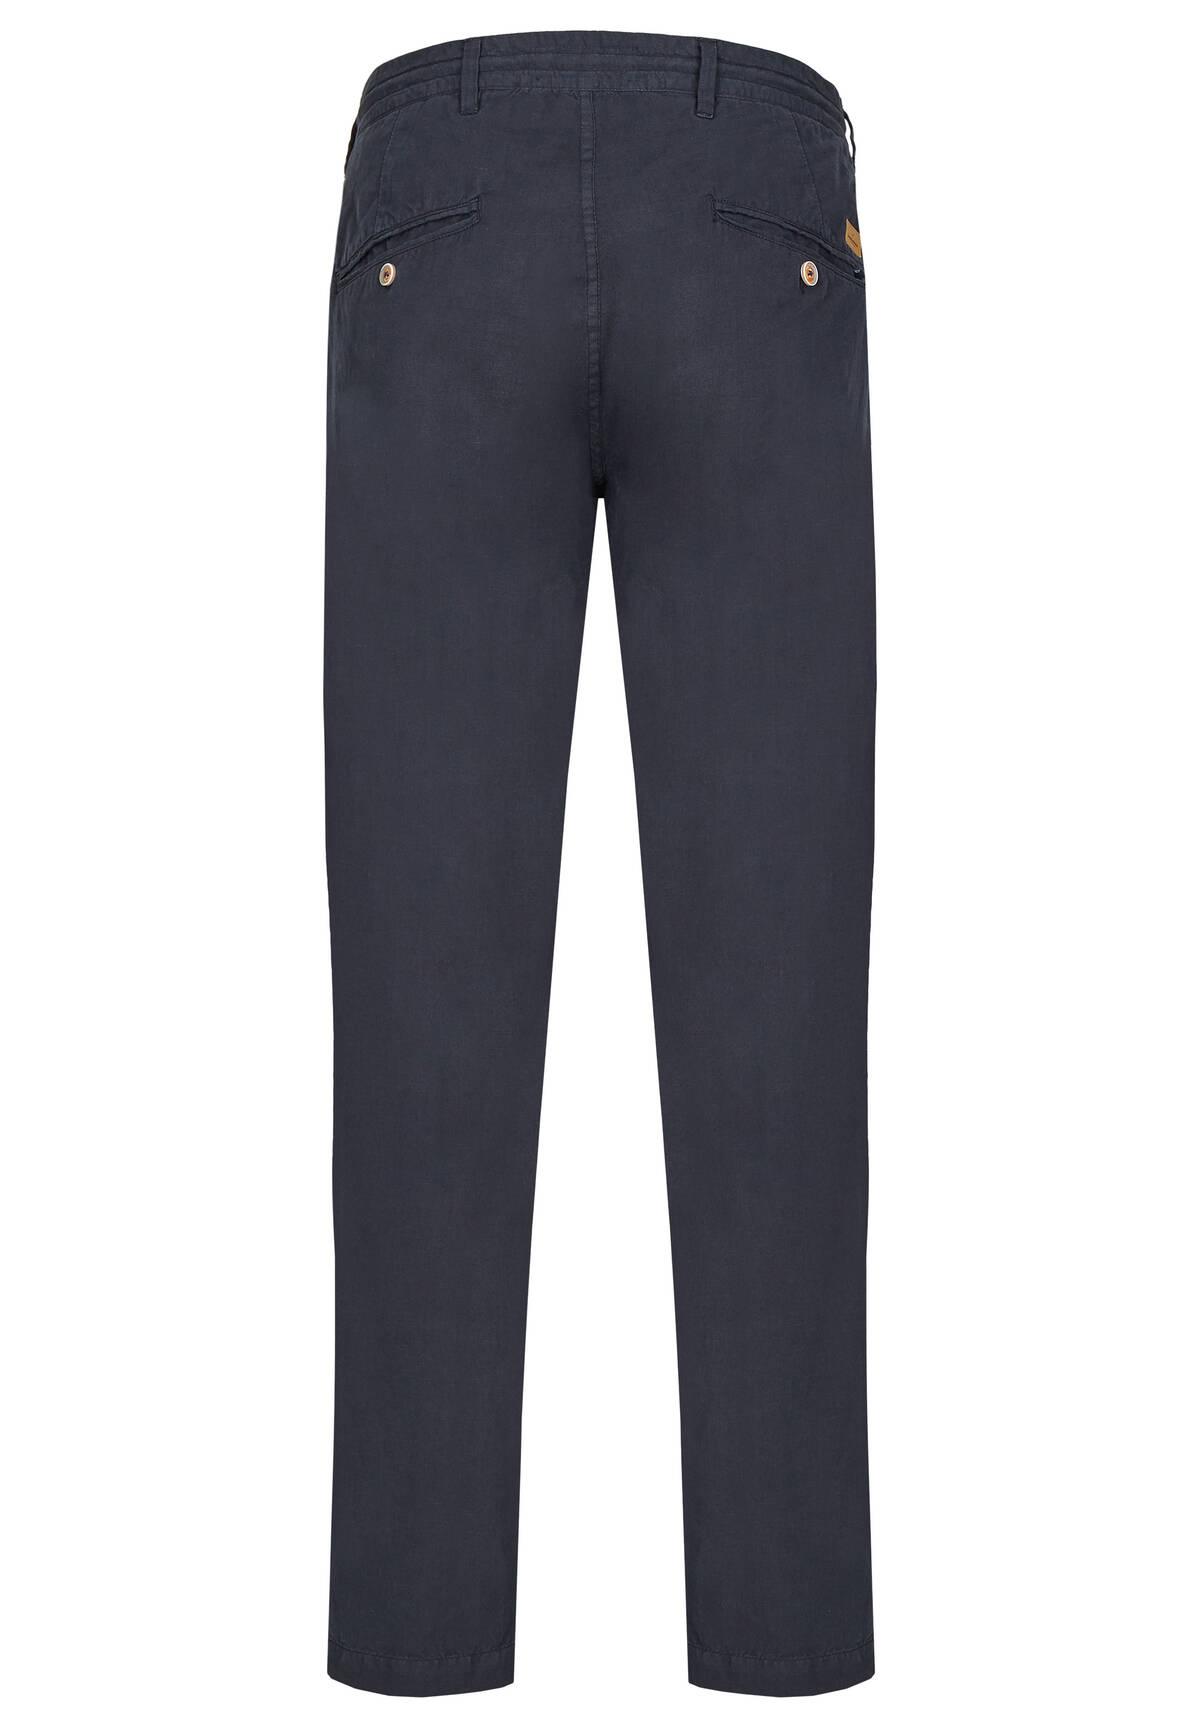 Pantalon façon Chino /